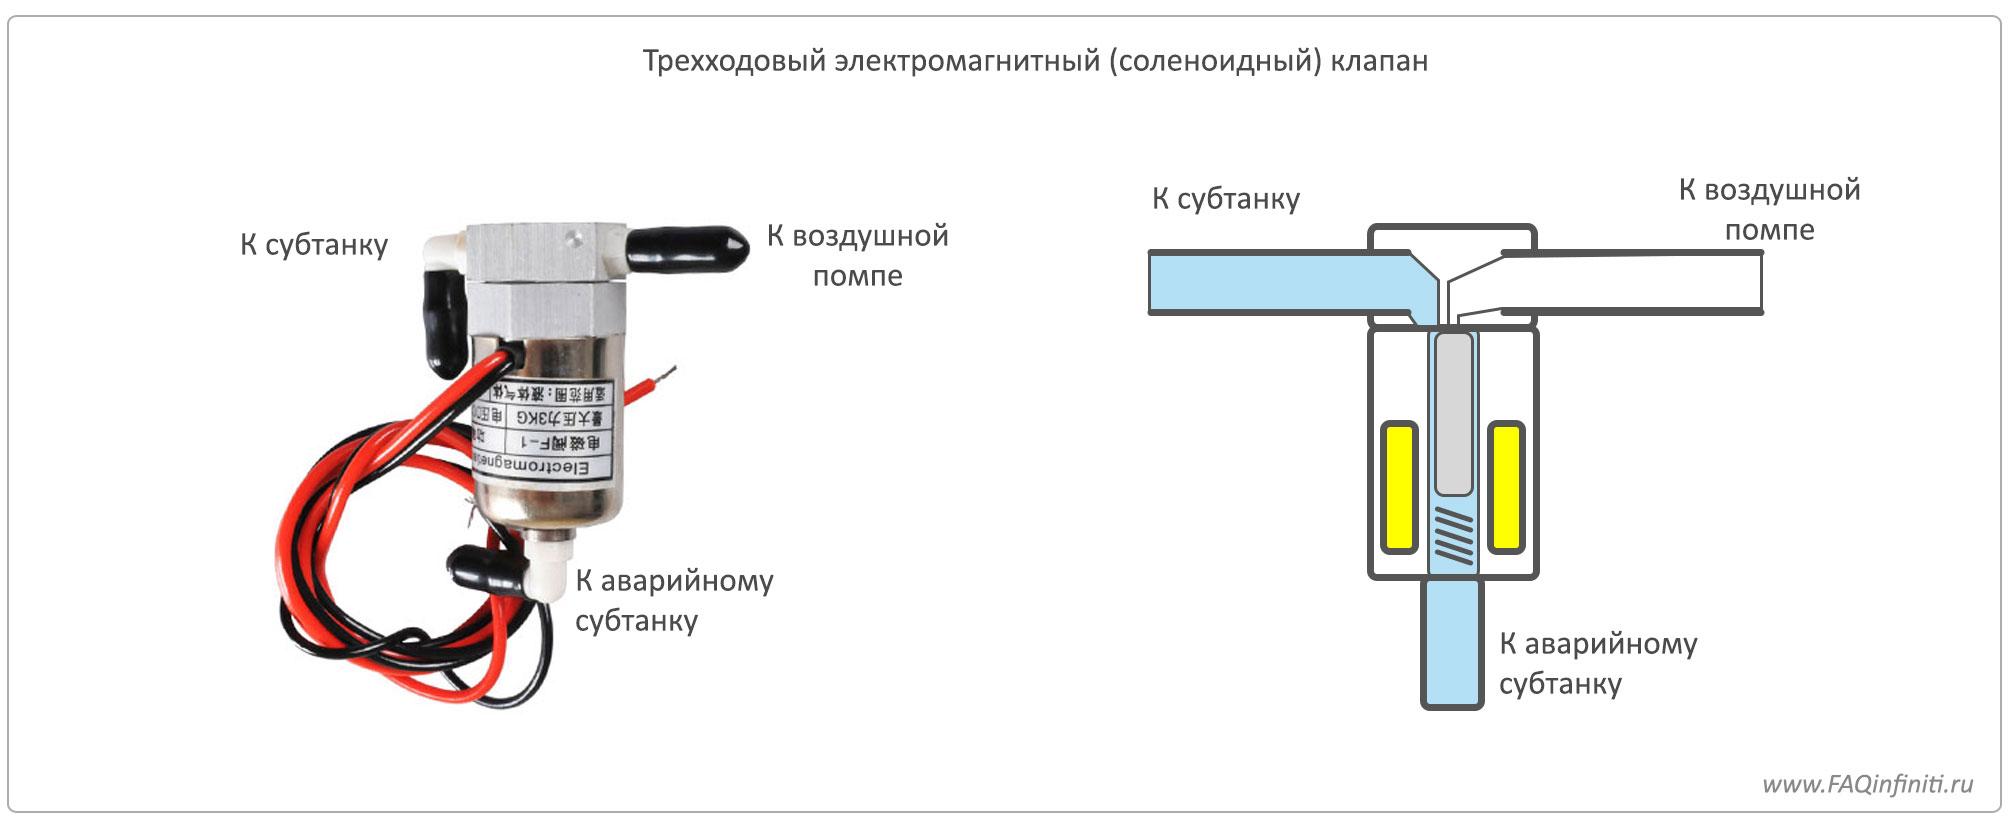 Особенности установки электромагнитного клапана на карбюратор солекс